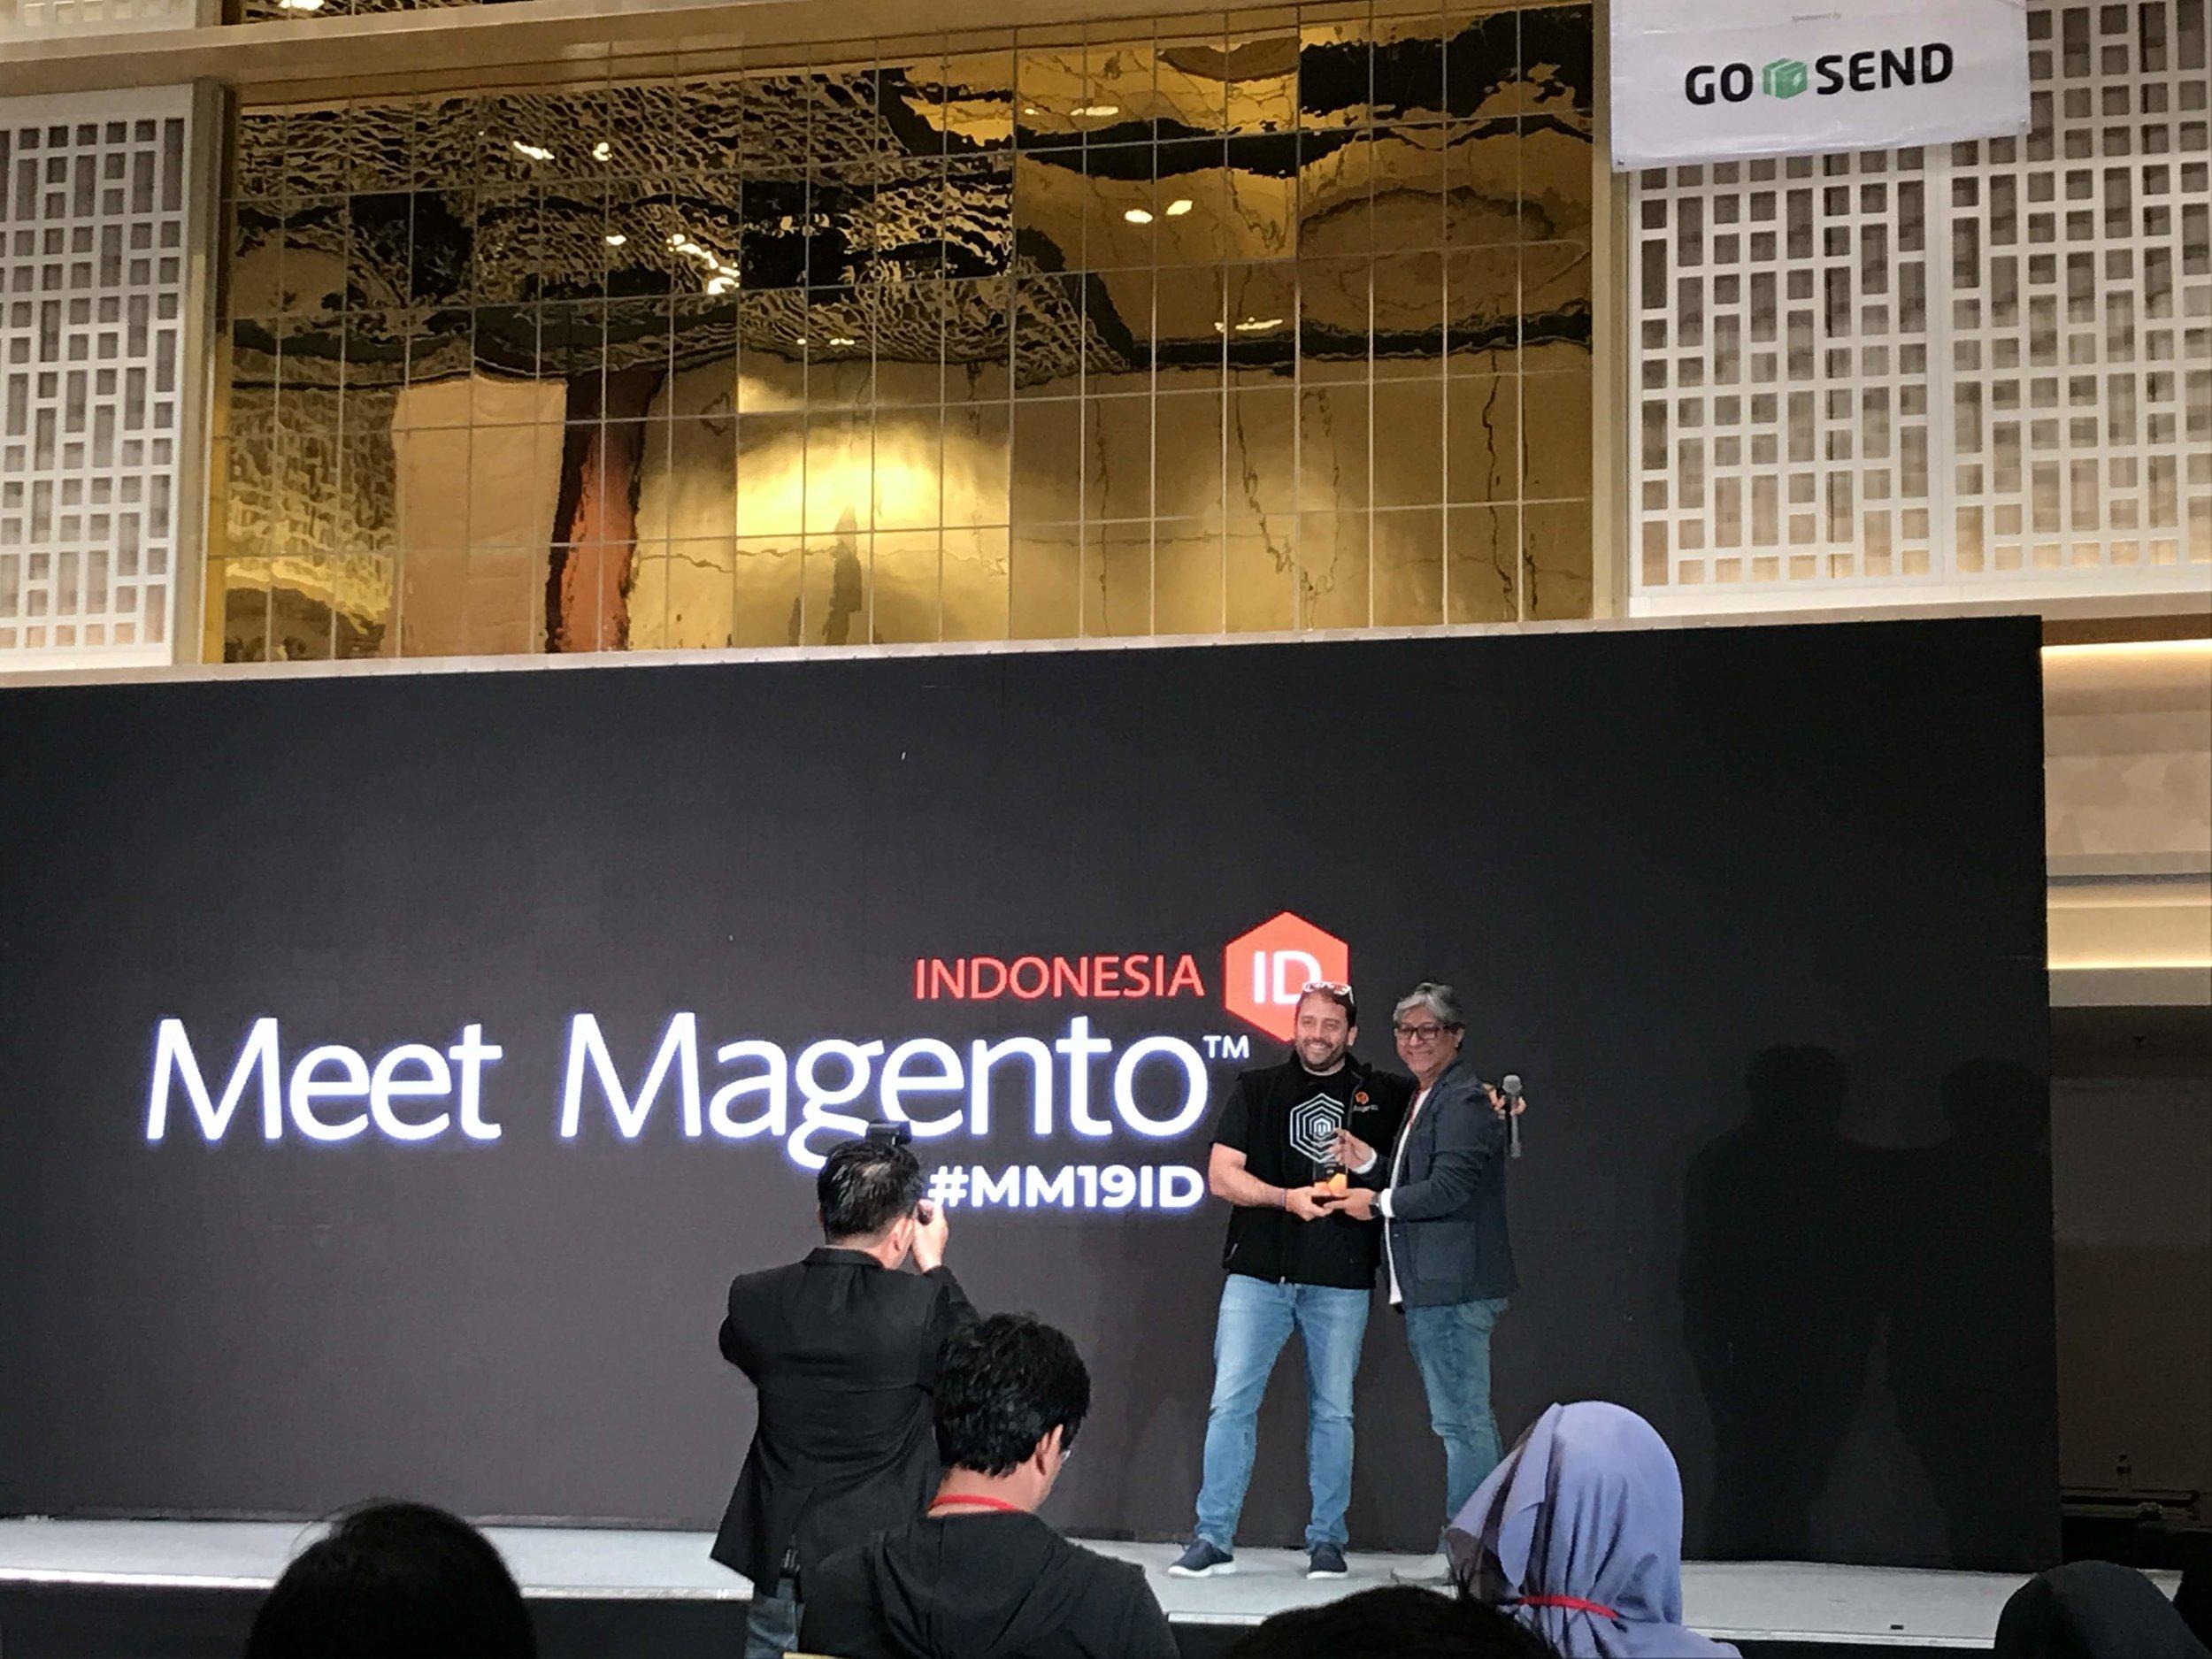 Muliadi Jeo (Founder of ICUBE) dan Ben Marks (Magento Evangelist) dalam memungkasi acara Meet Magento Indonesia 2019